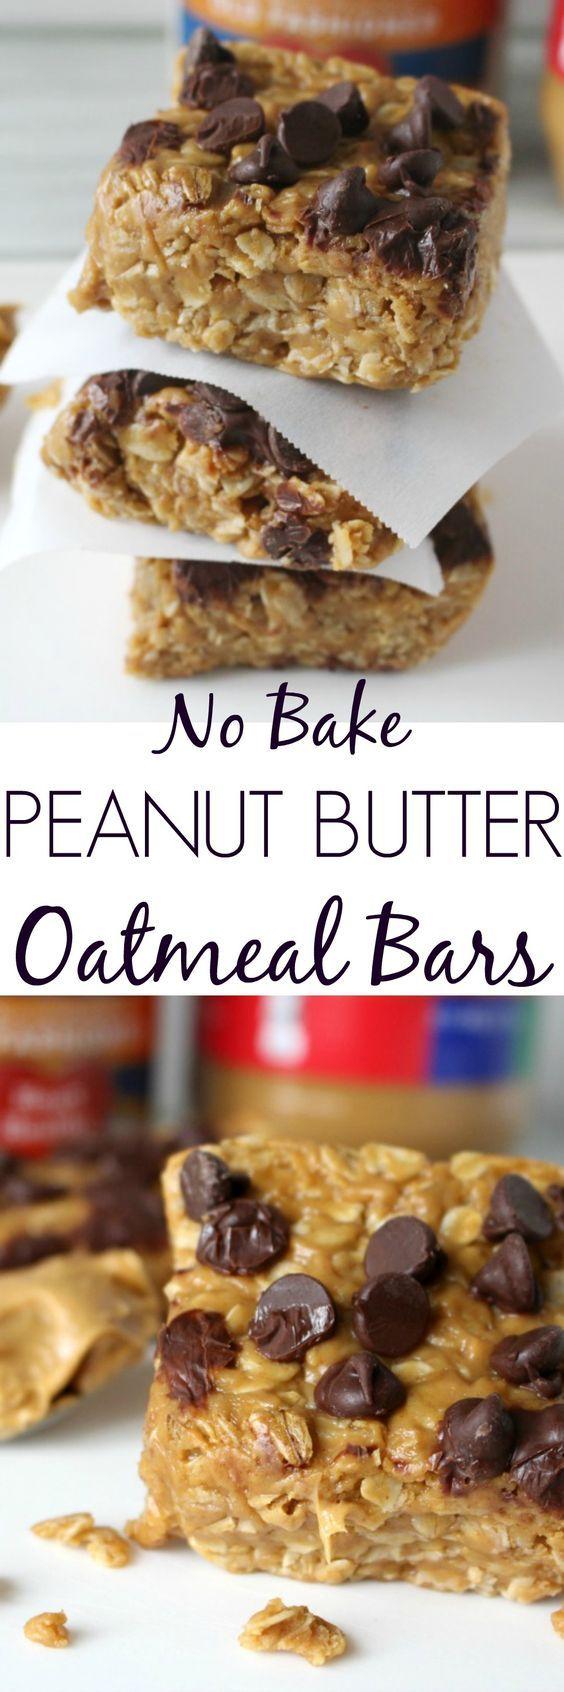 No Bake Peanut Butter Oatmeal Bars  Princess Pinky Girl (Vegan Muffin Peanut Butter)